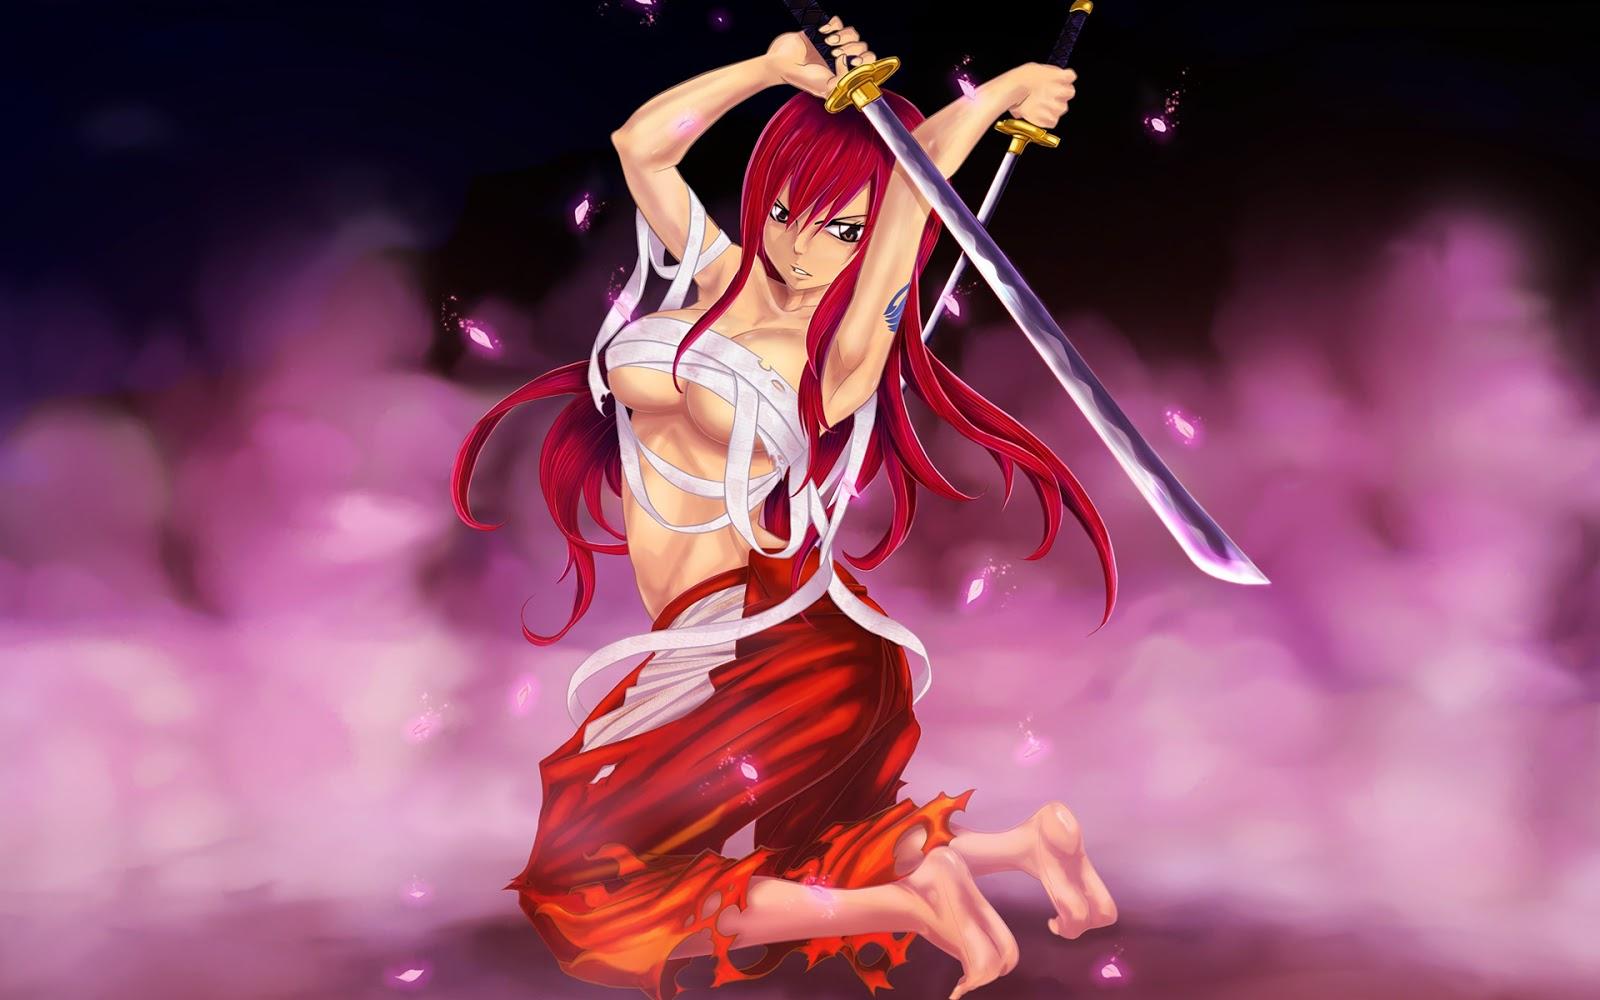 sexy erza scarlet katana girl anime hd 1600x1000